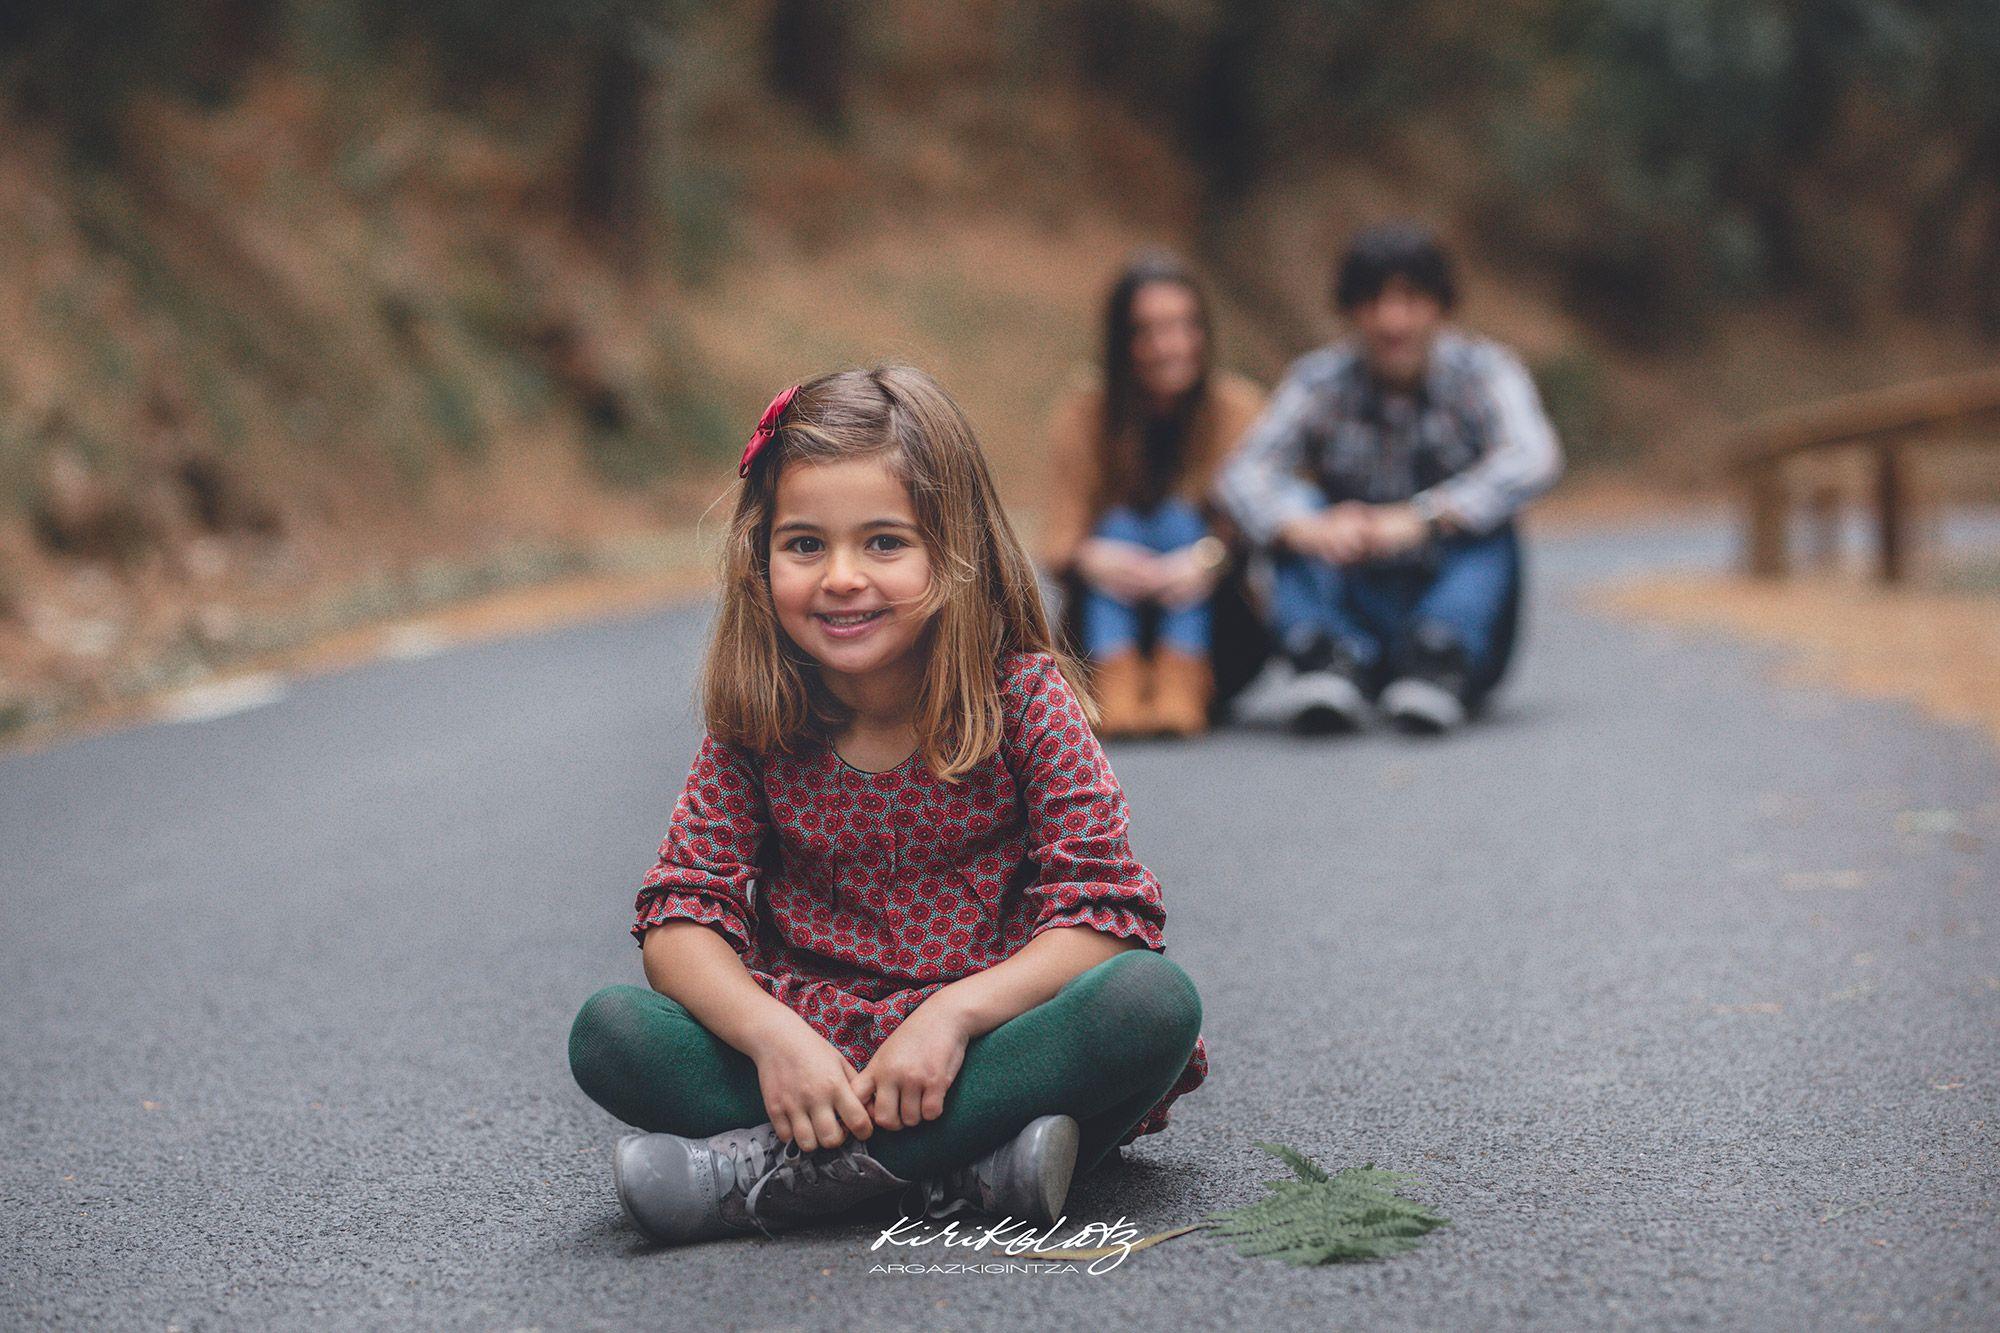 Fotografia Infantil Familias Fotos Bizkaia Naturaleza Kirikolatz Fotografos